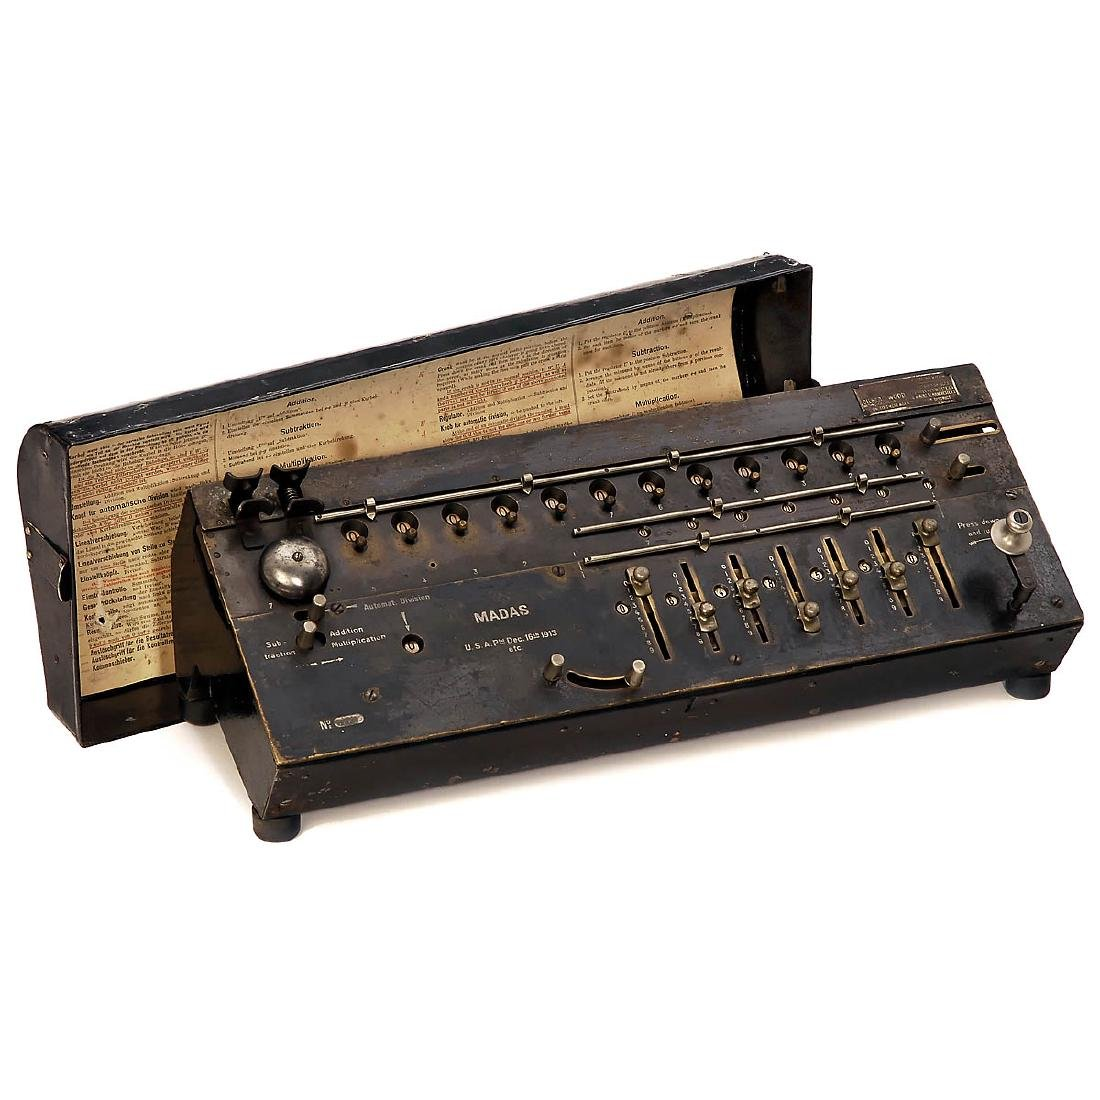 Madas Calculating Machine, 1913